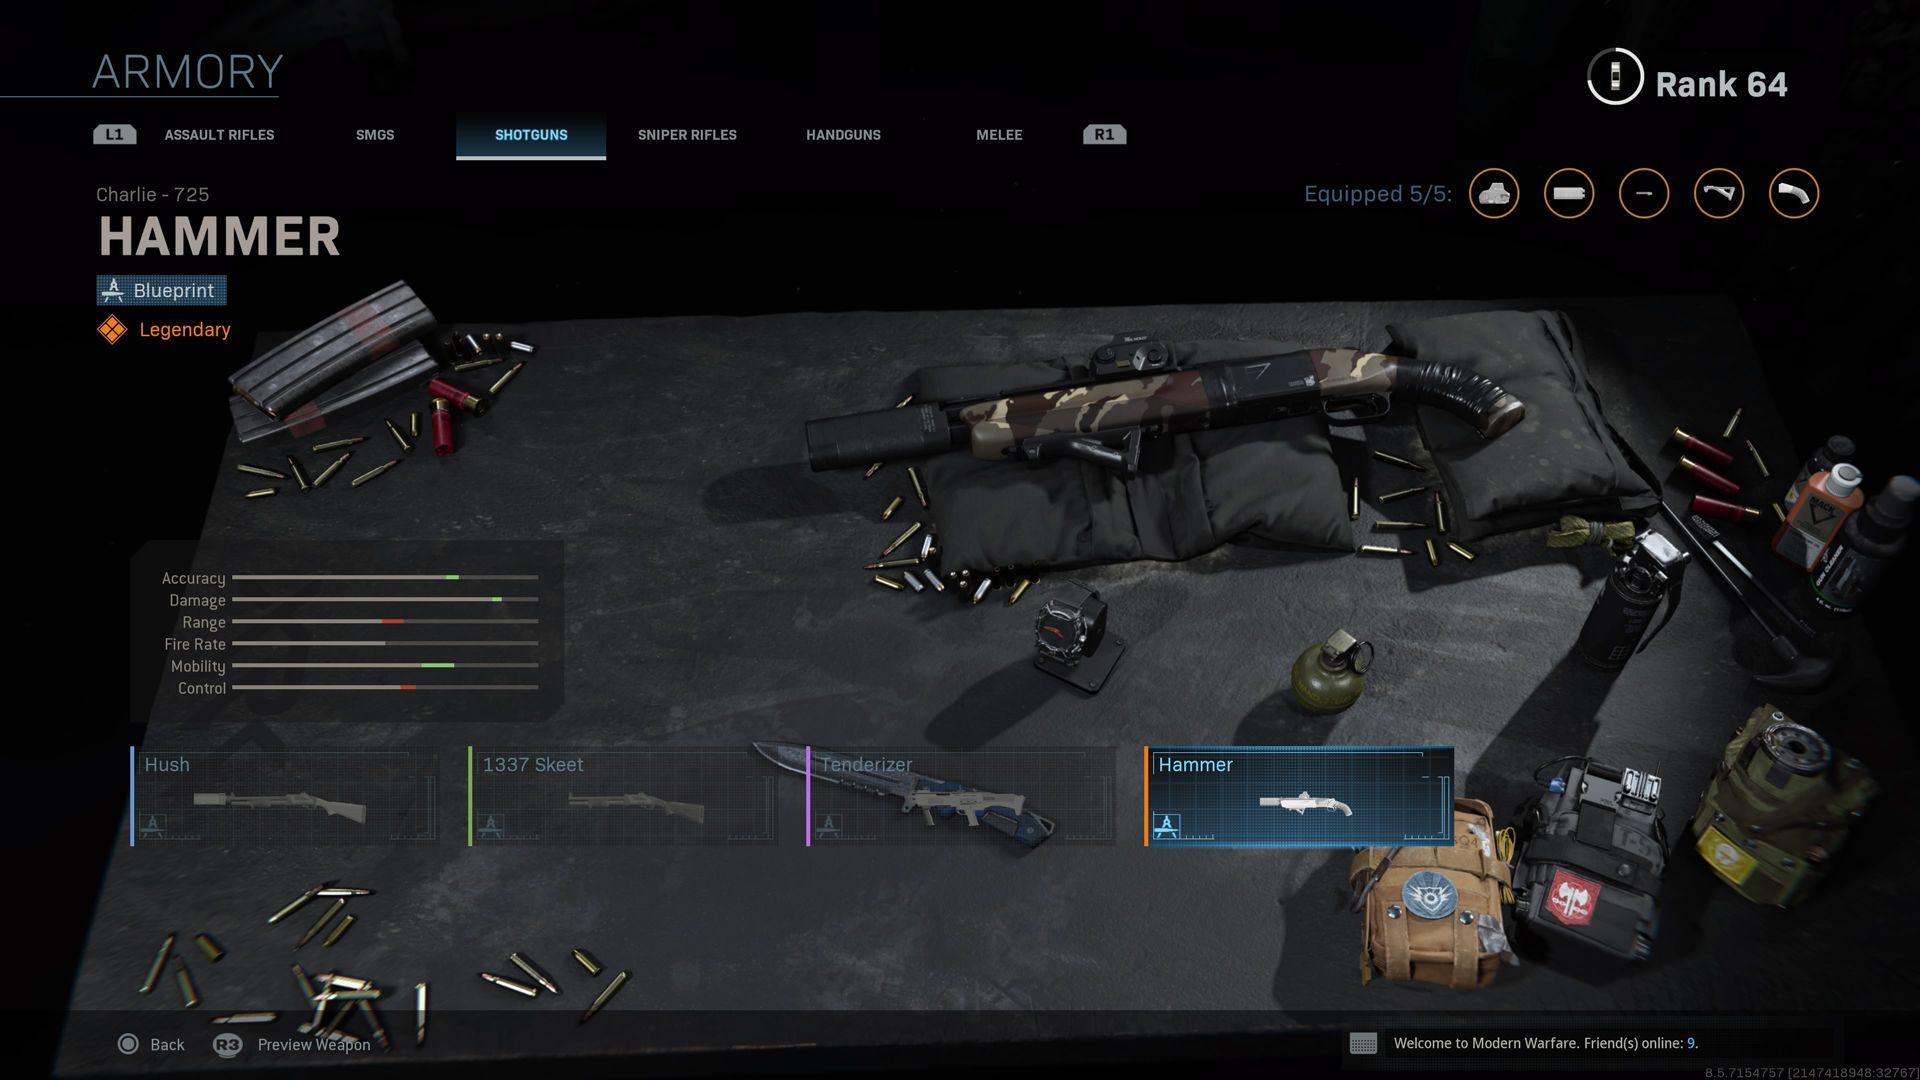 Call of Duty Modern Warfare Infinity Ward blueprint